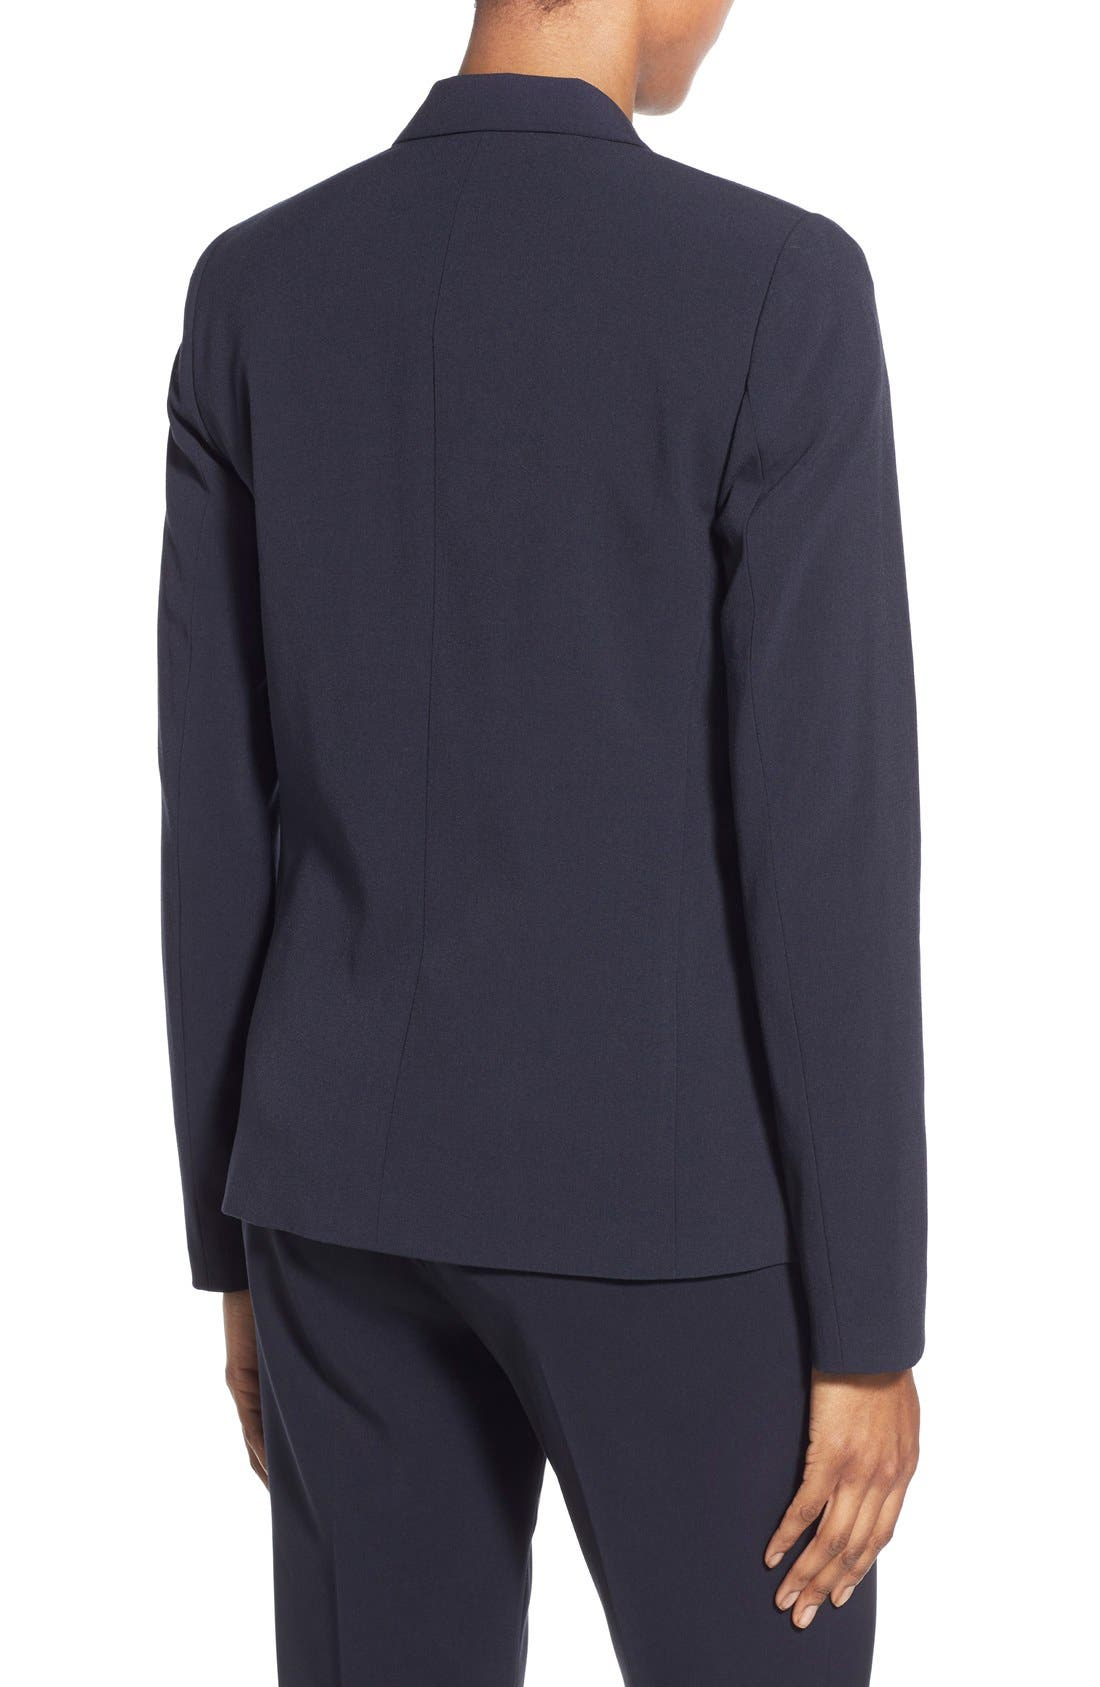 Alternate Image 3  - T Tahari Jolie Stretch Woven Suit Jacket